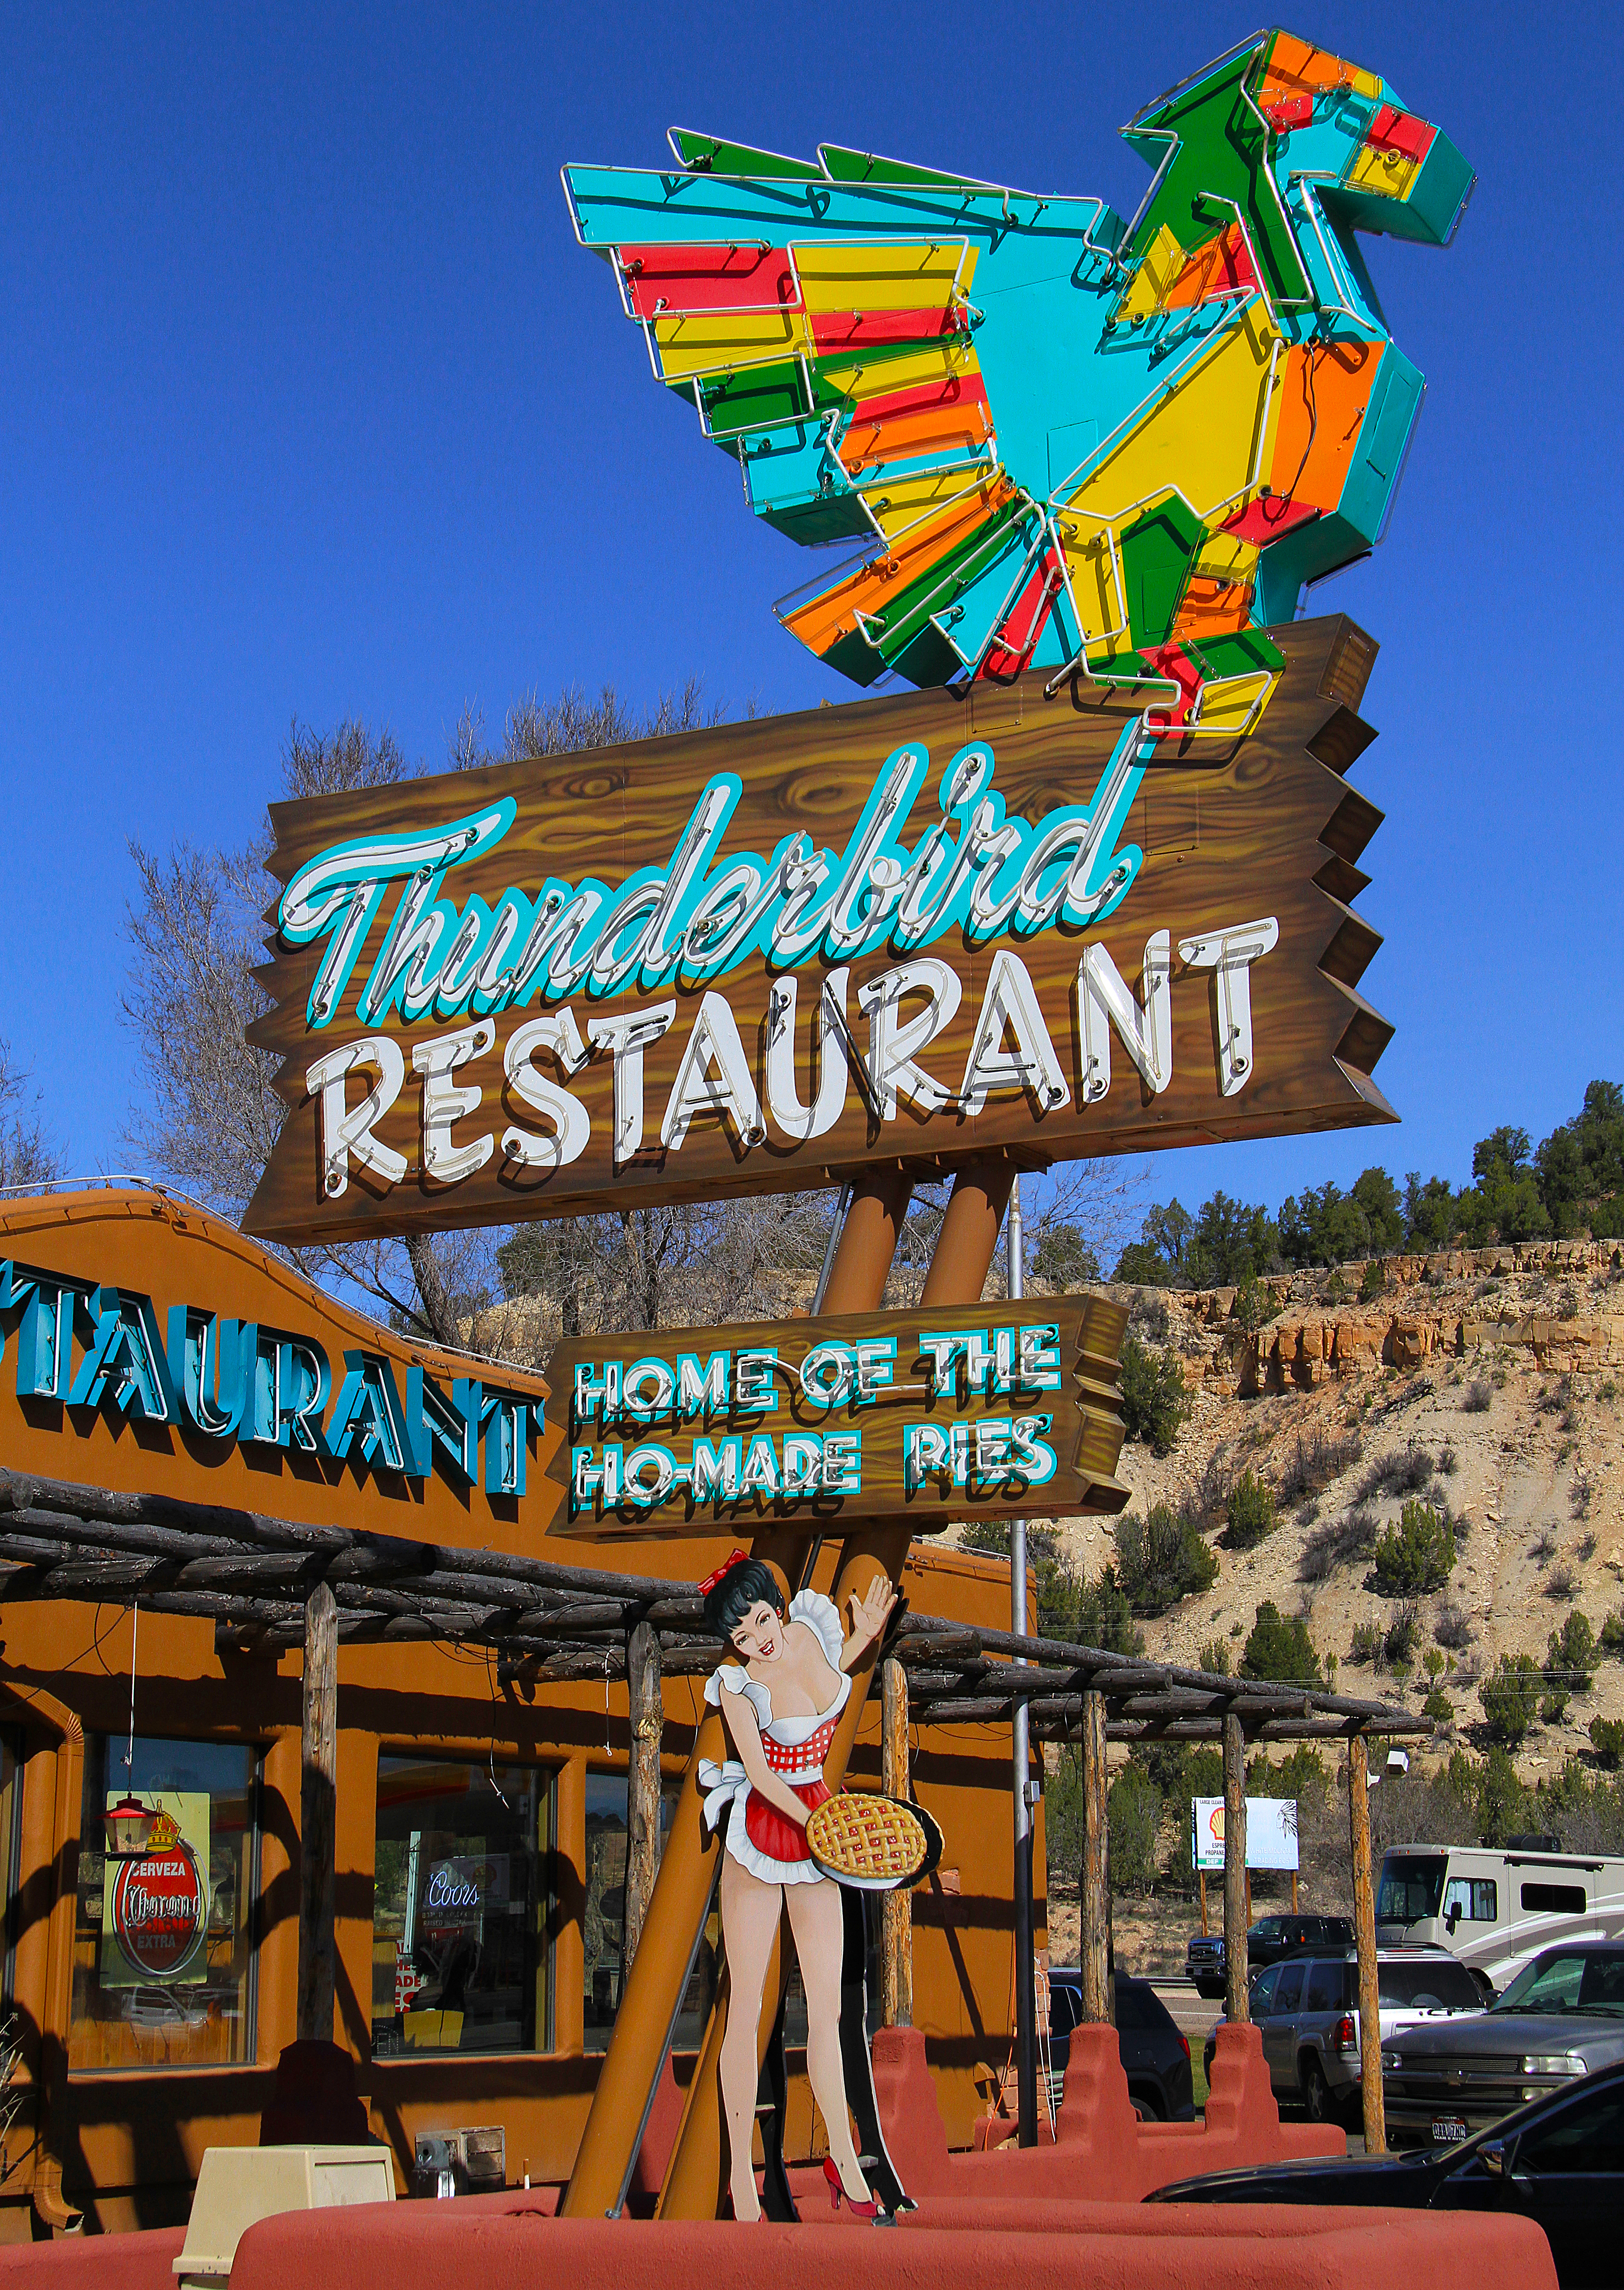 Thunderbird Restaurant - Junction U.S. Route 89 & Utah State Route 9, Mount Carmel, Utah U.S.A. - March 16, 2017